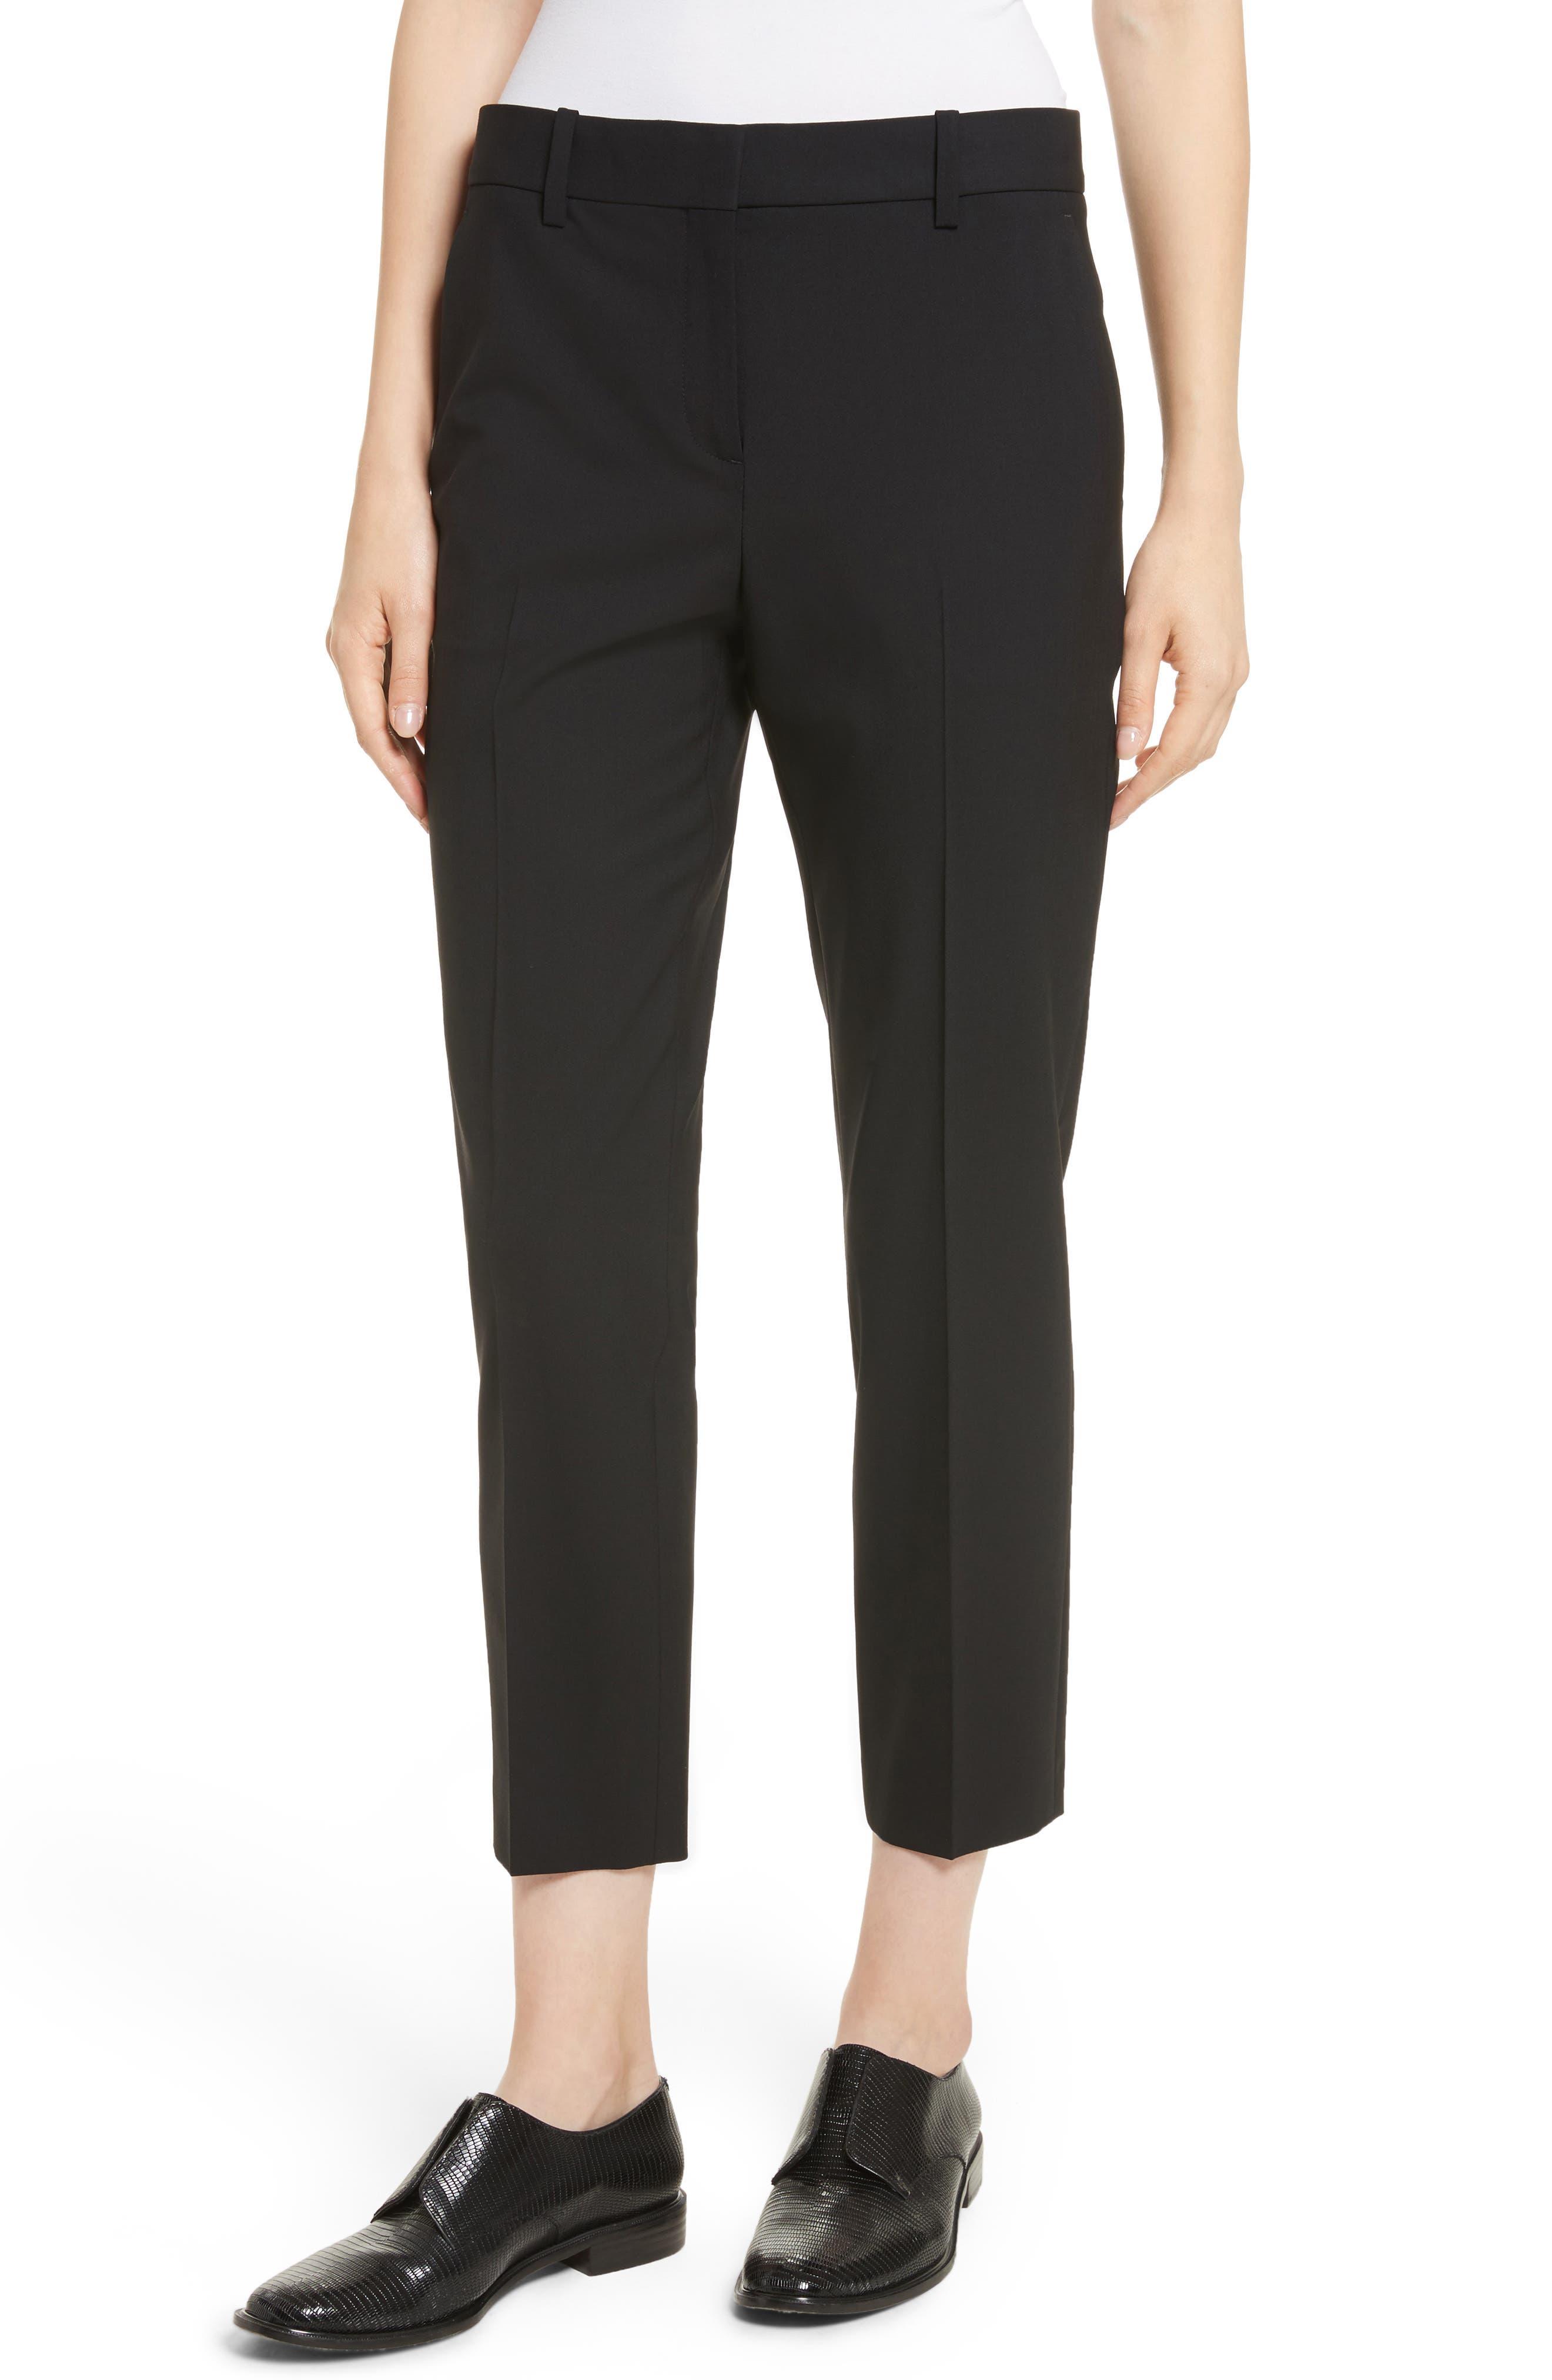 THEORY Treeca 2 Good Wool Crop Suit Pants, Main, color, BLACK